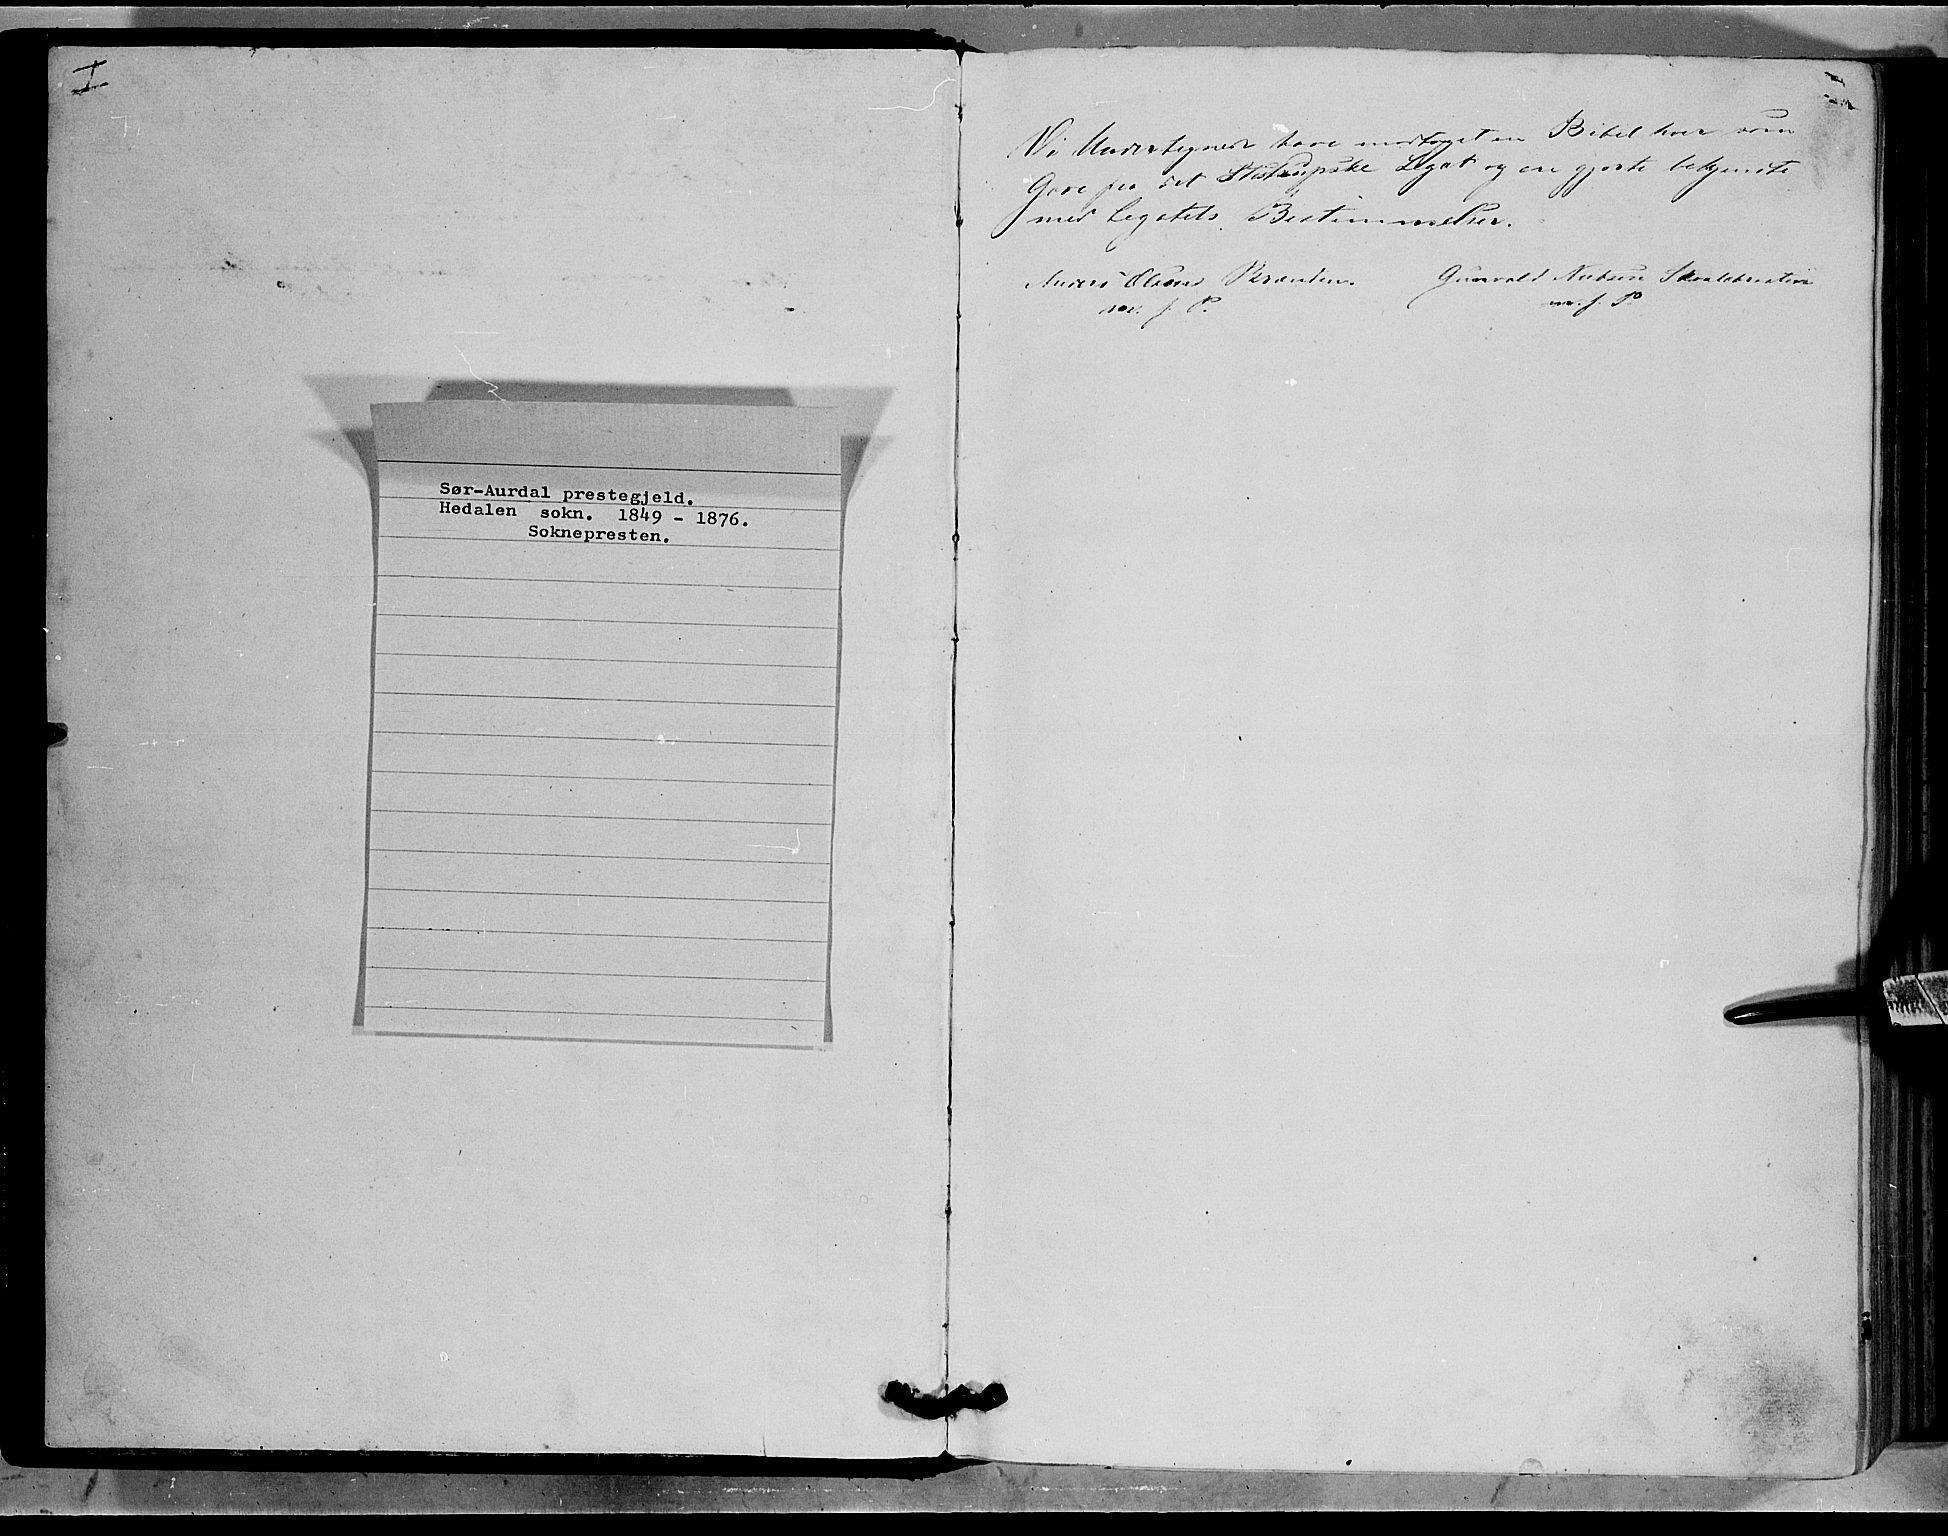 SAH, Sør-Aurdal prestekontor, Ministerialbok nr. 7, 1849-1876